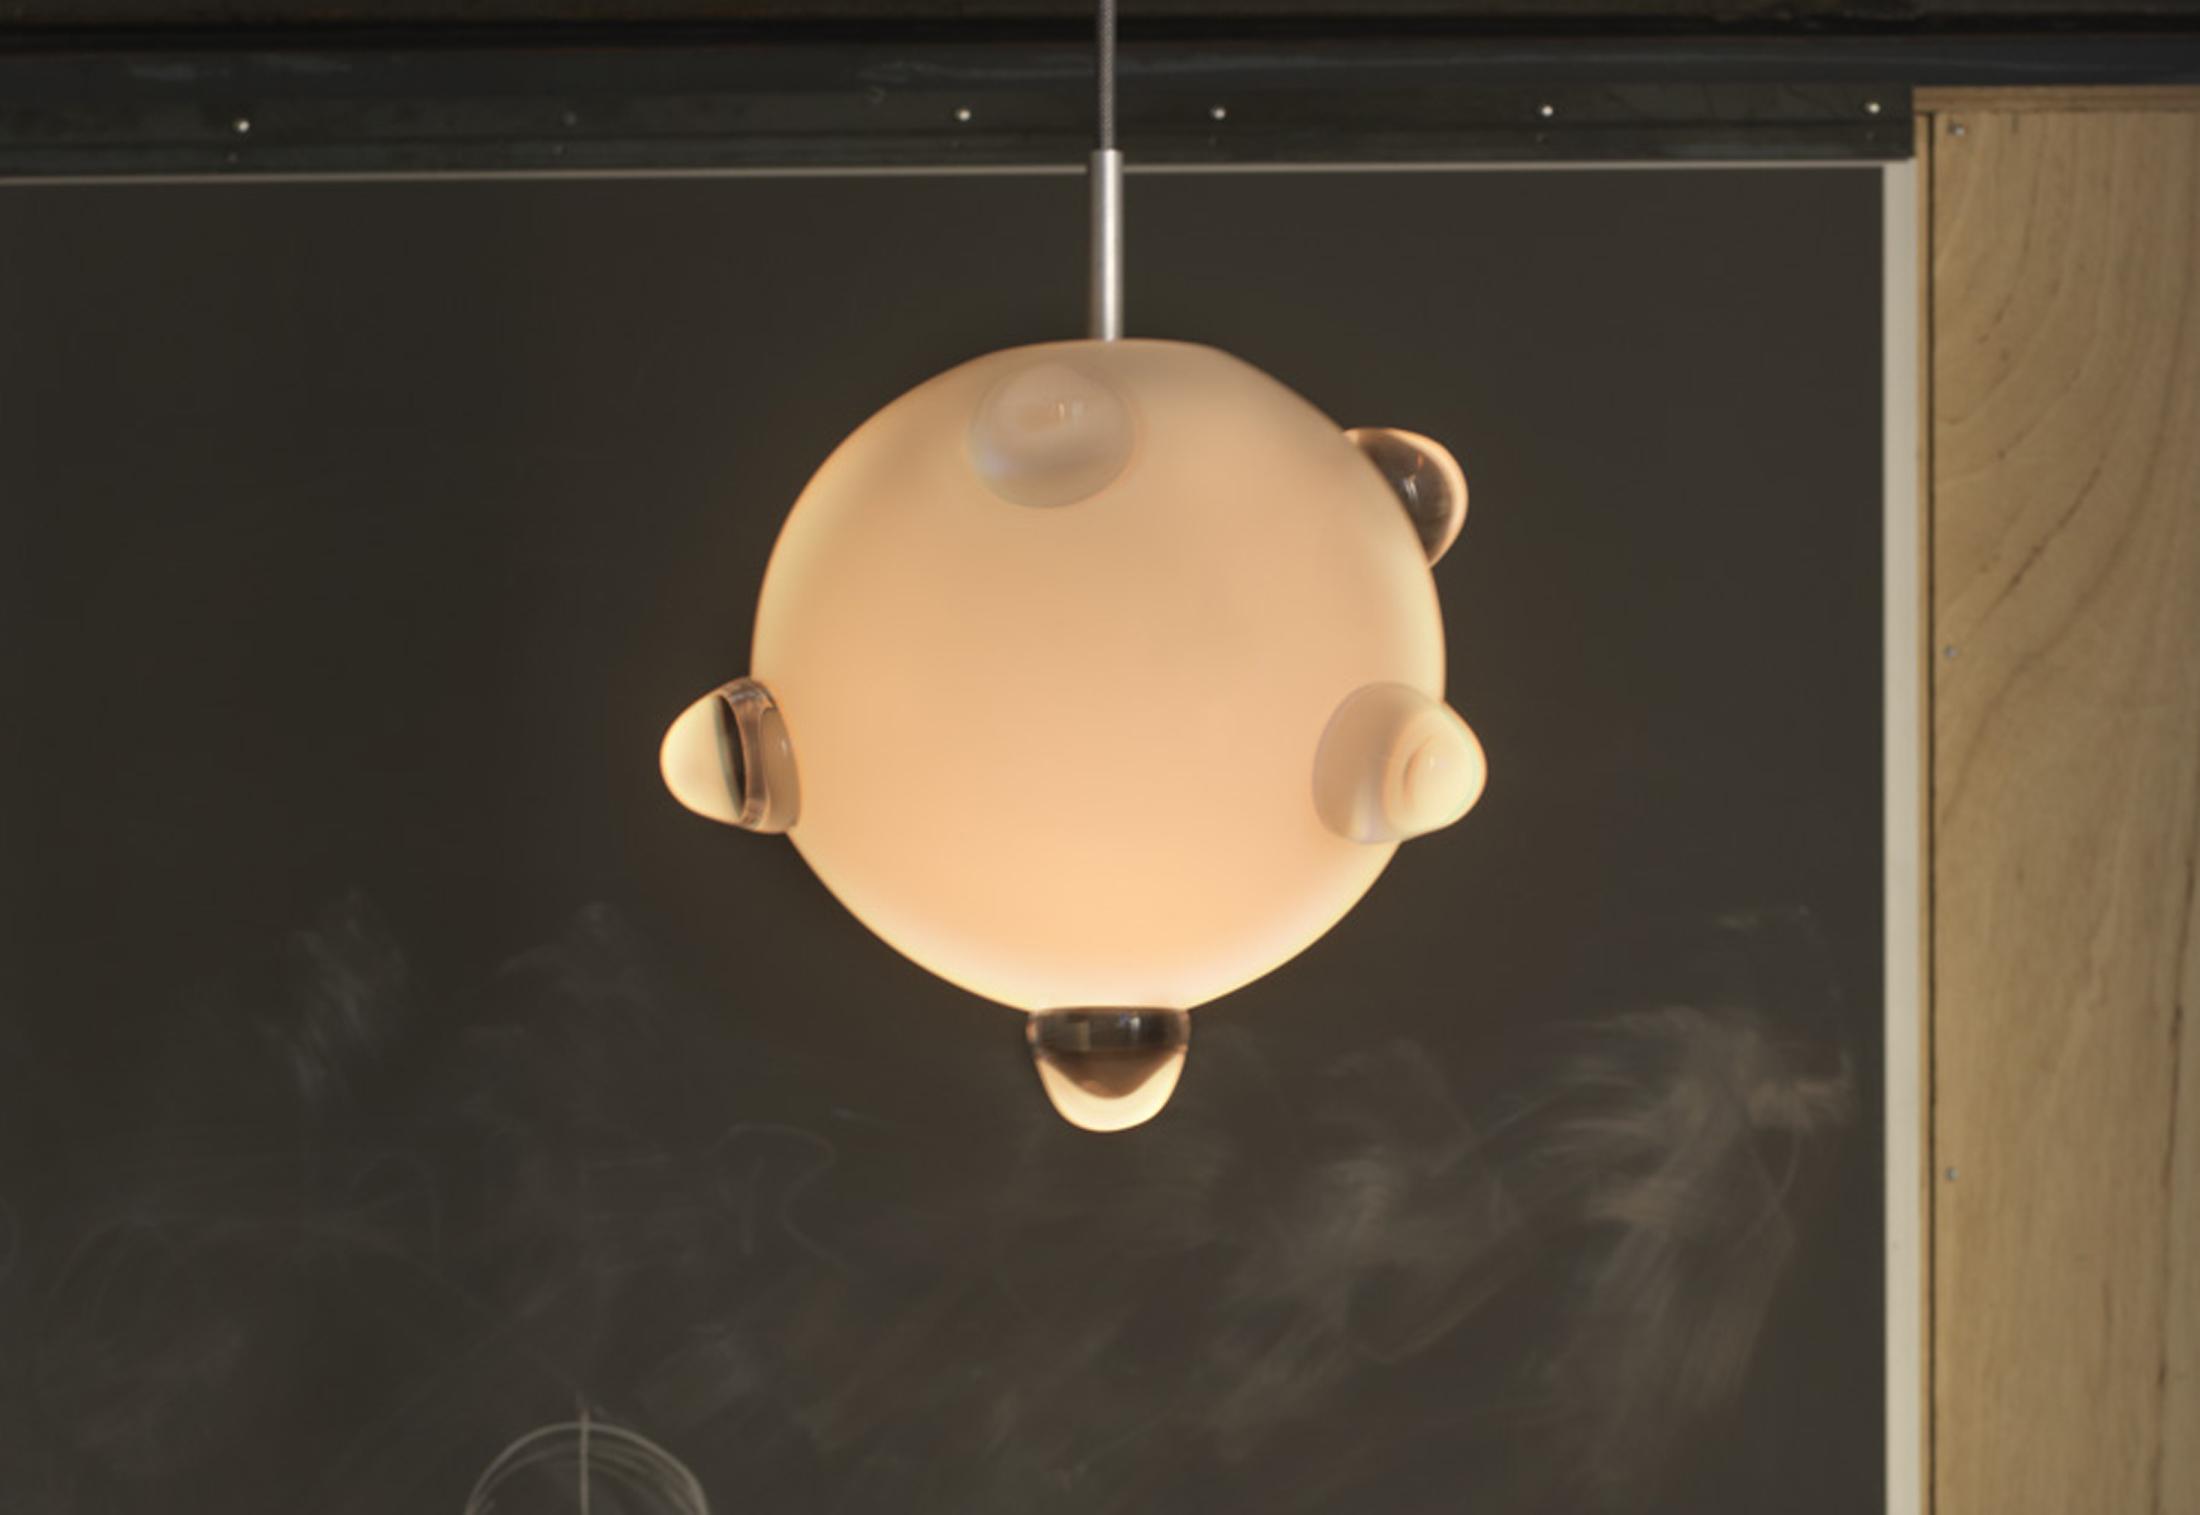 Awesome Nova Lighting Wall Art Model - Wall Art Collections ...